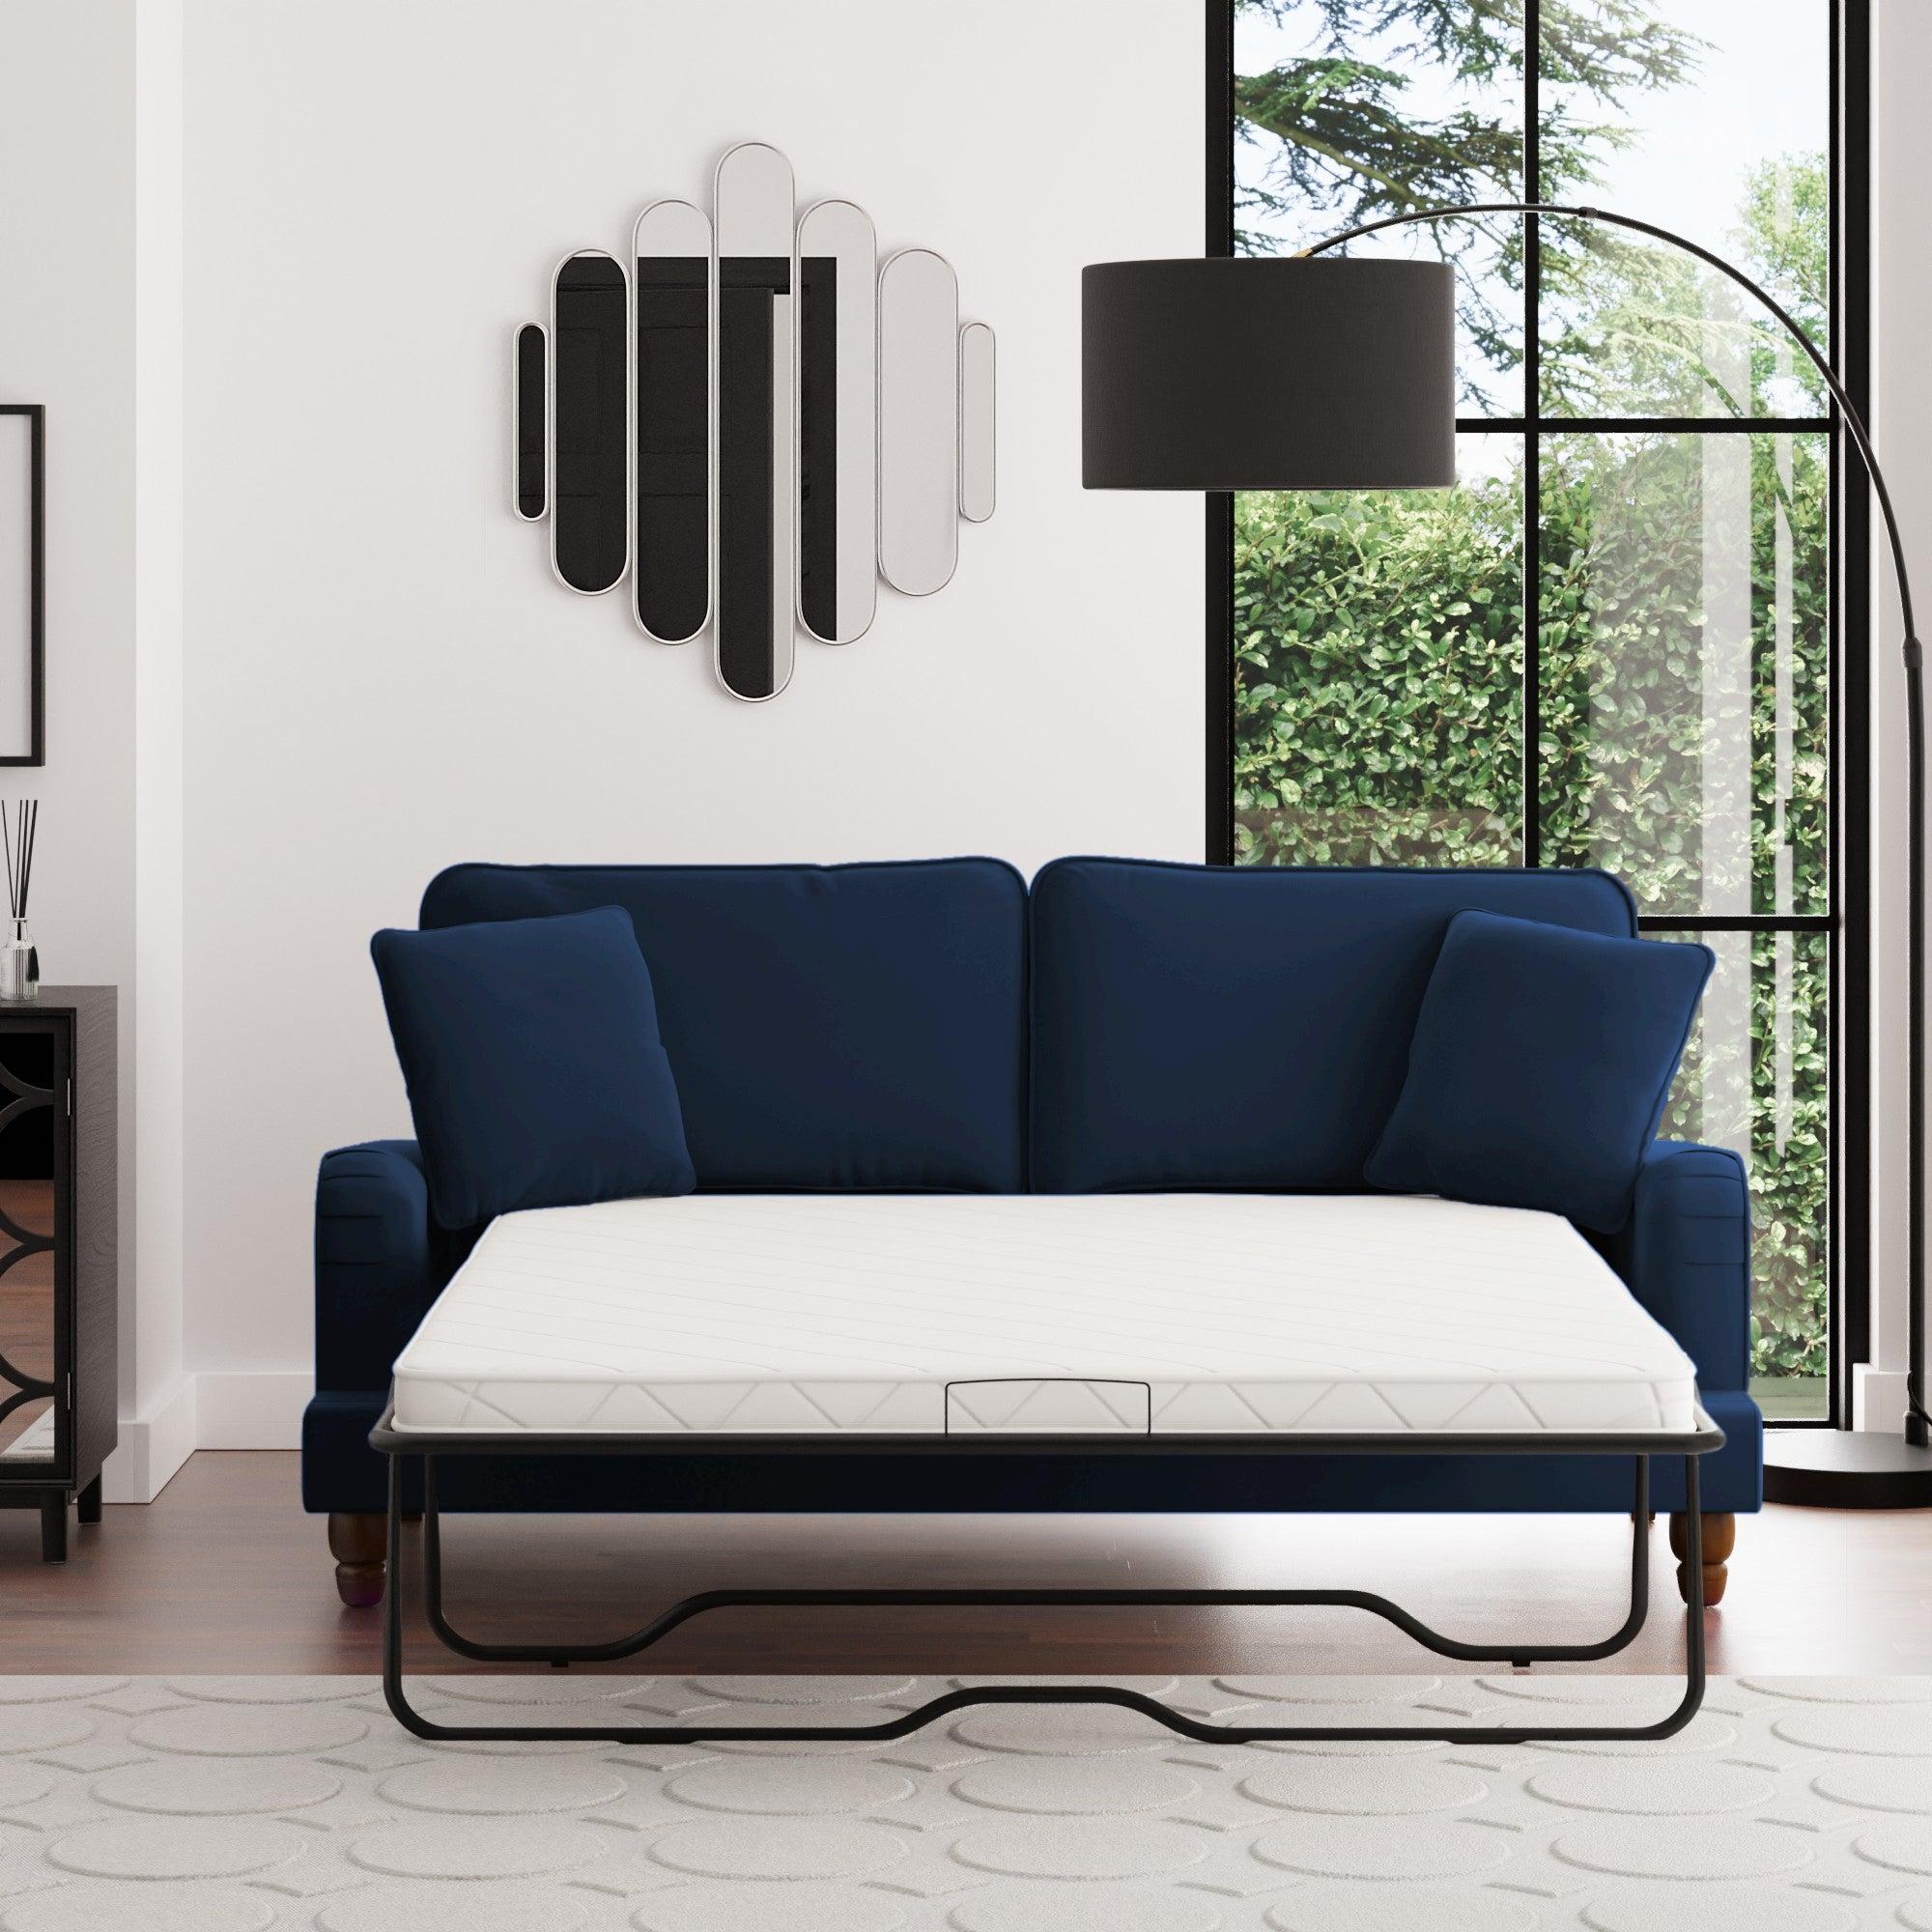 Beatrice Velvet 3 Seater Sofa Bed Luxe Navy